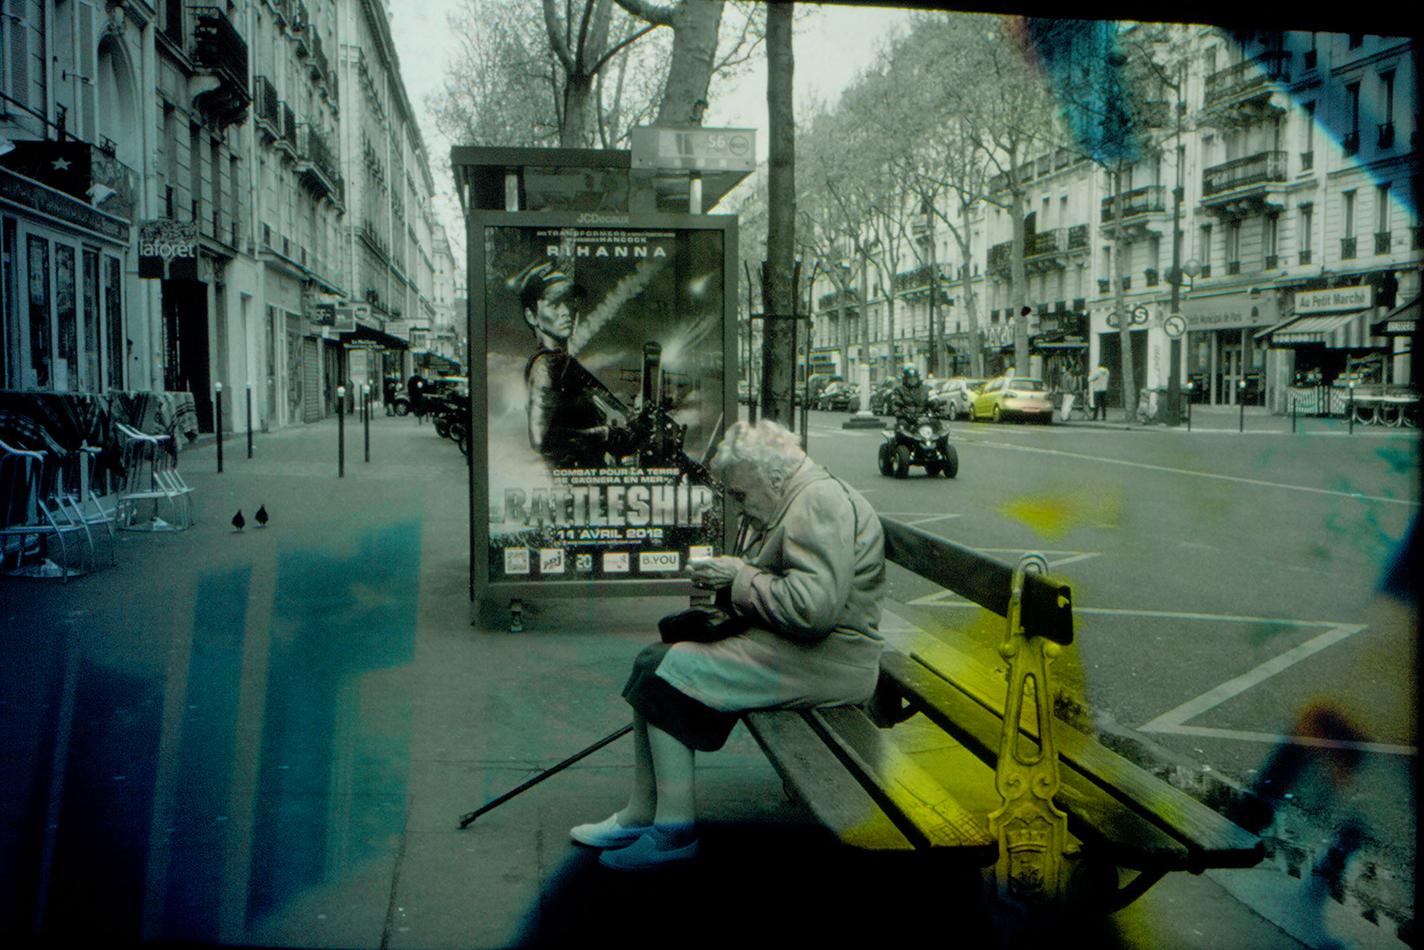 http://fred.chapotat.free.fr/indexhibitv070e/files/gimgs/152_ekta-souviens-toi-111.jpg